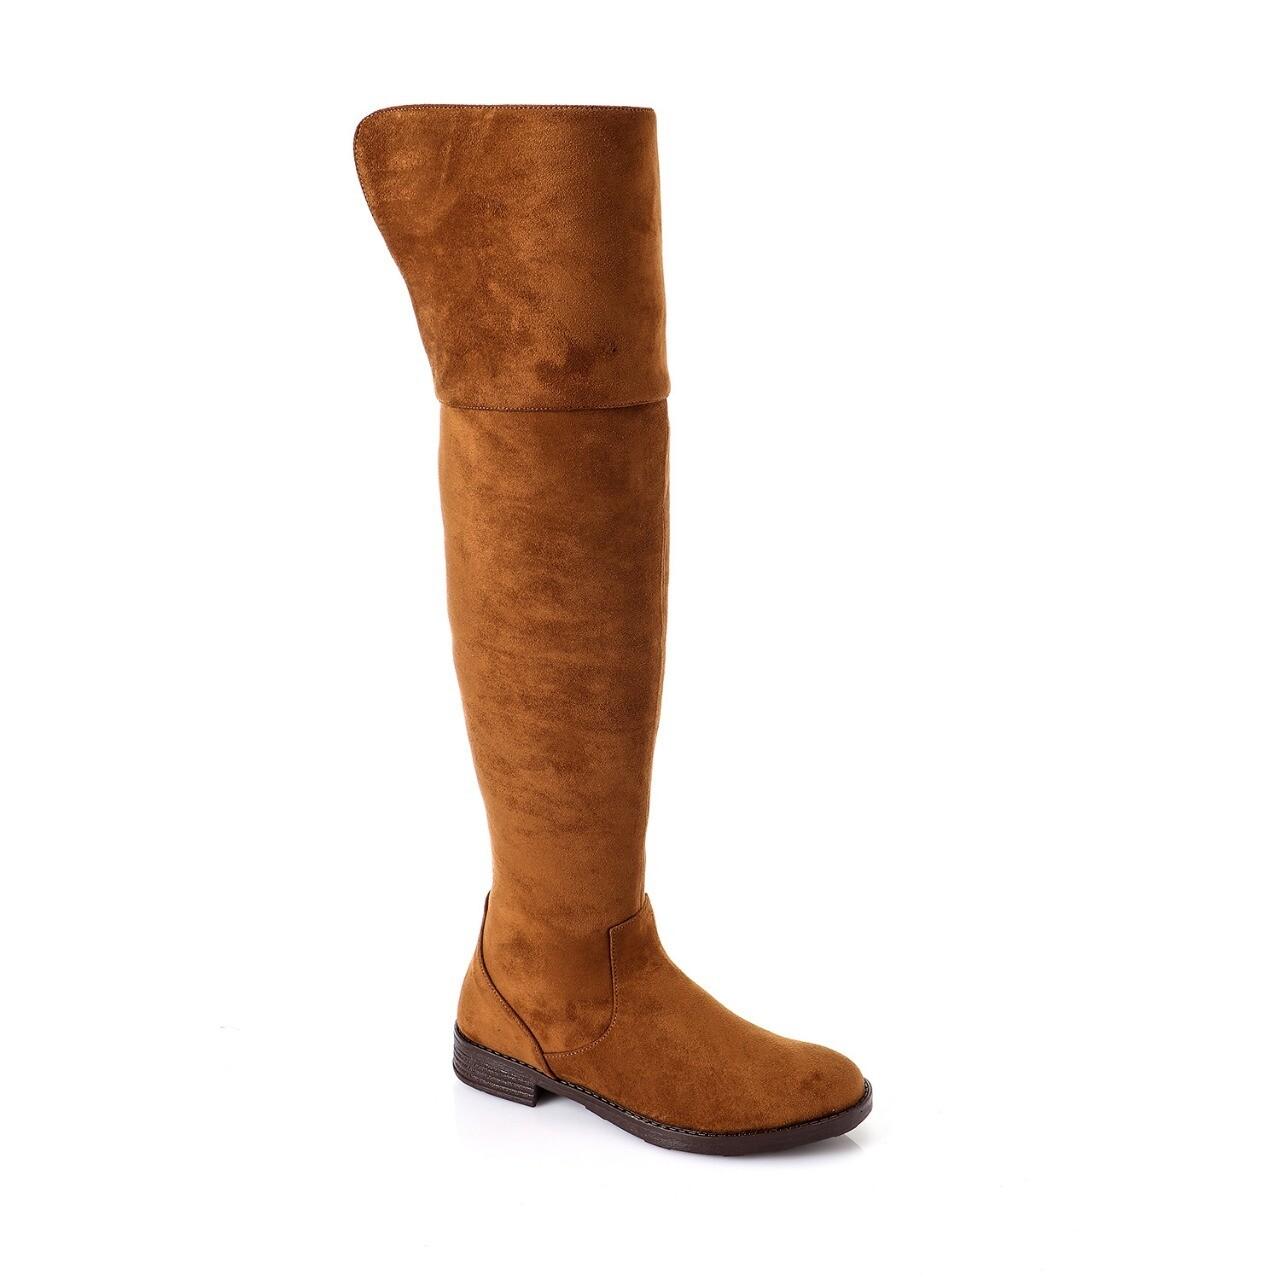 3765 Knee High Boot -CAMEL SU